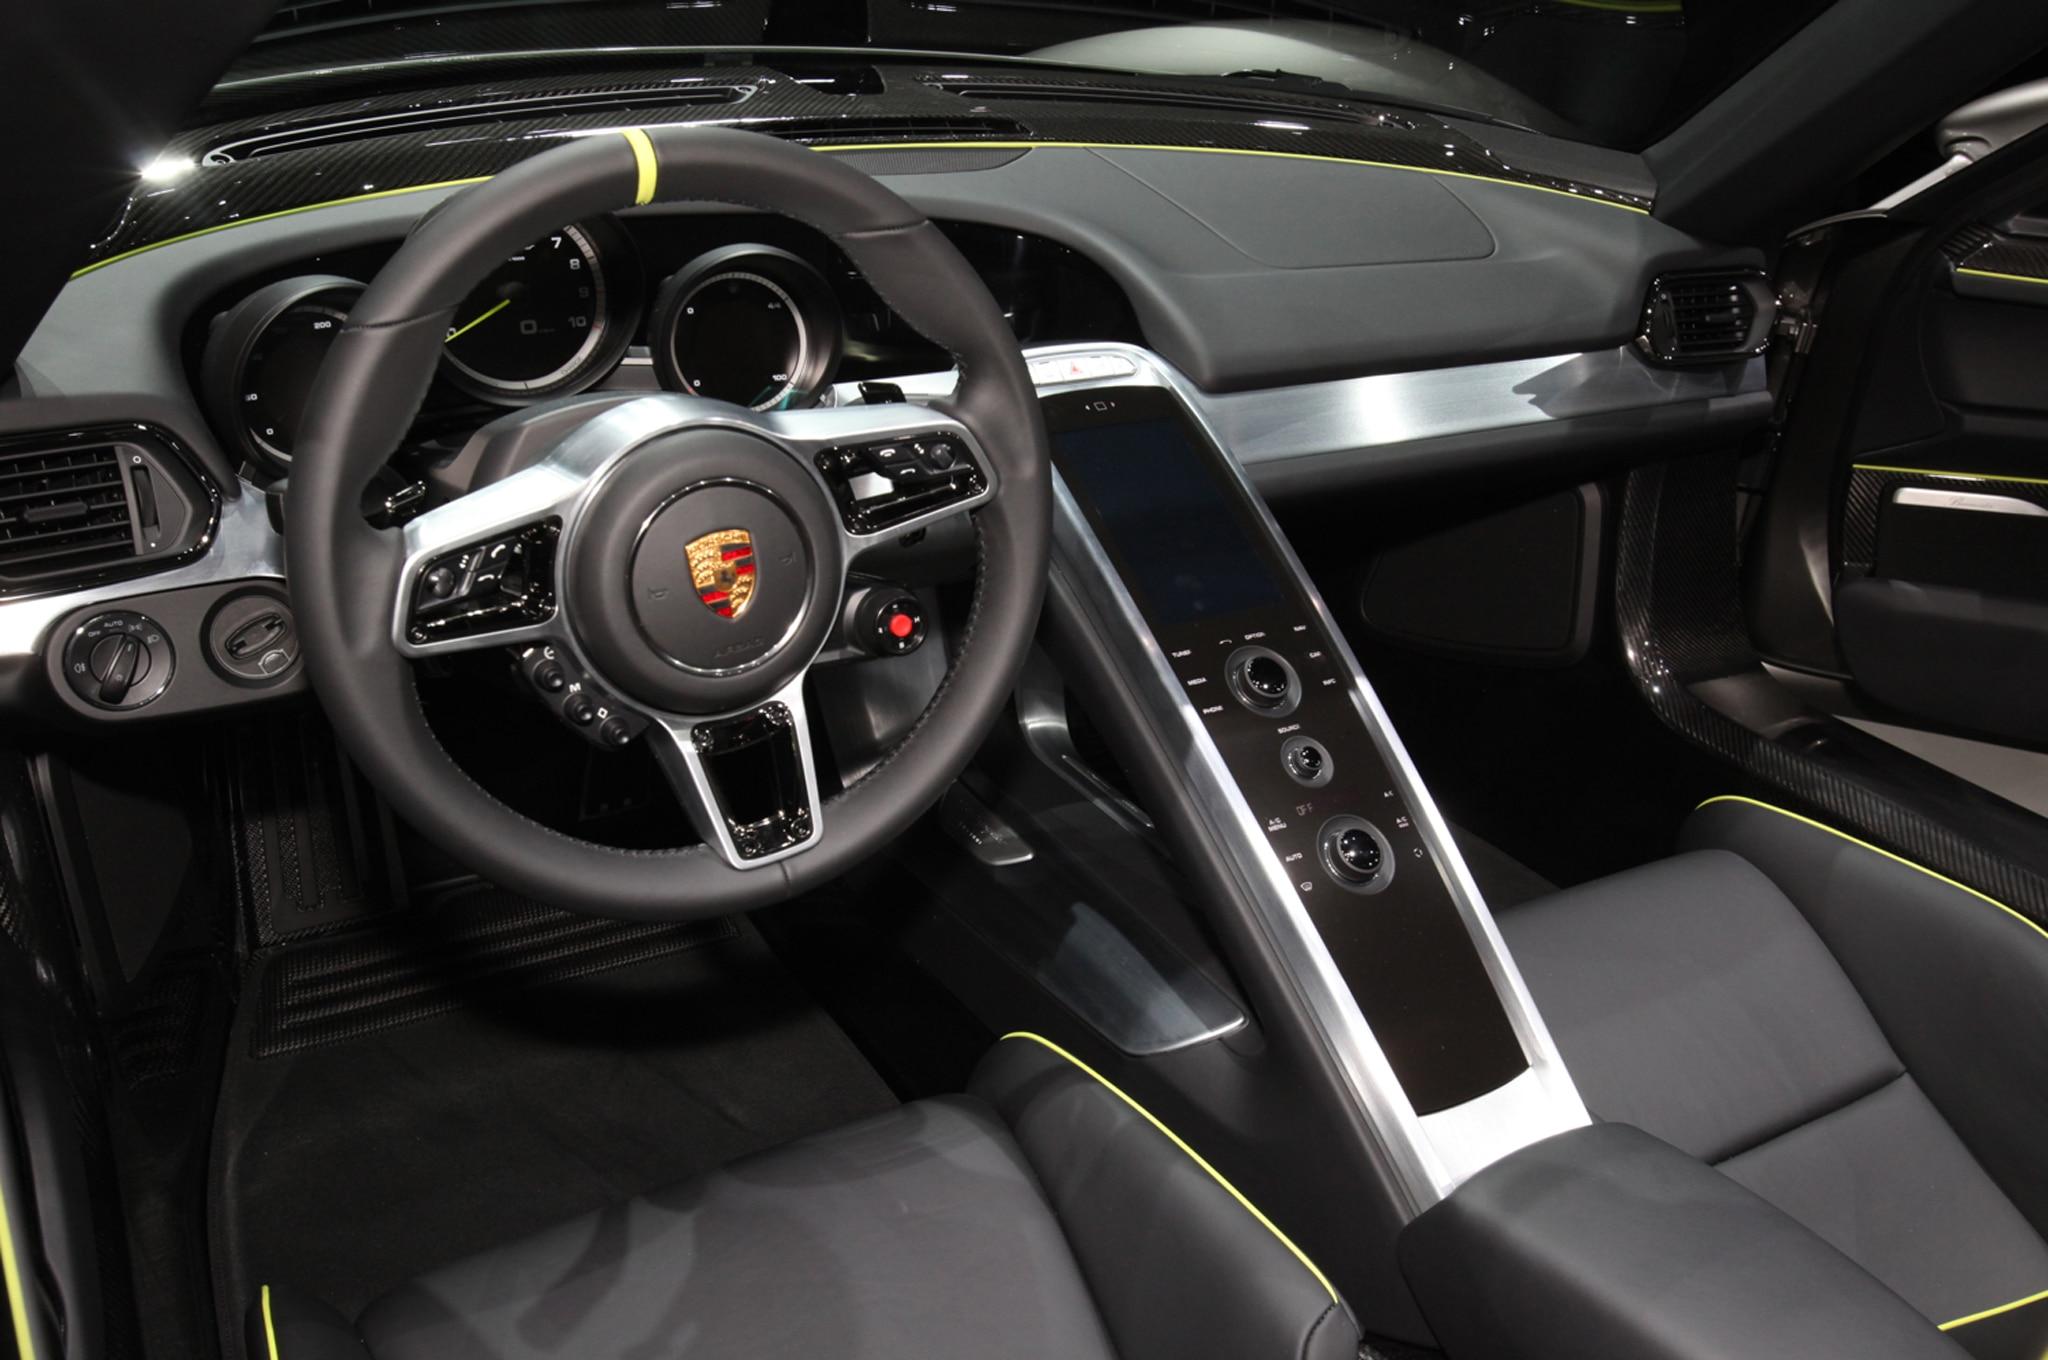 porsche 918 spyder 2015 interior. show more porsche 918 spyder 2015 interior